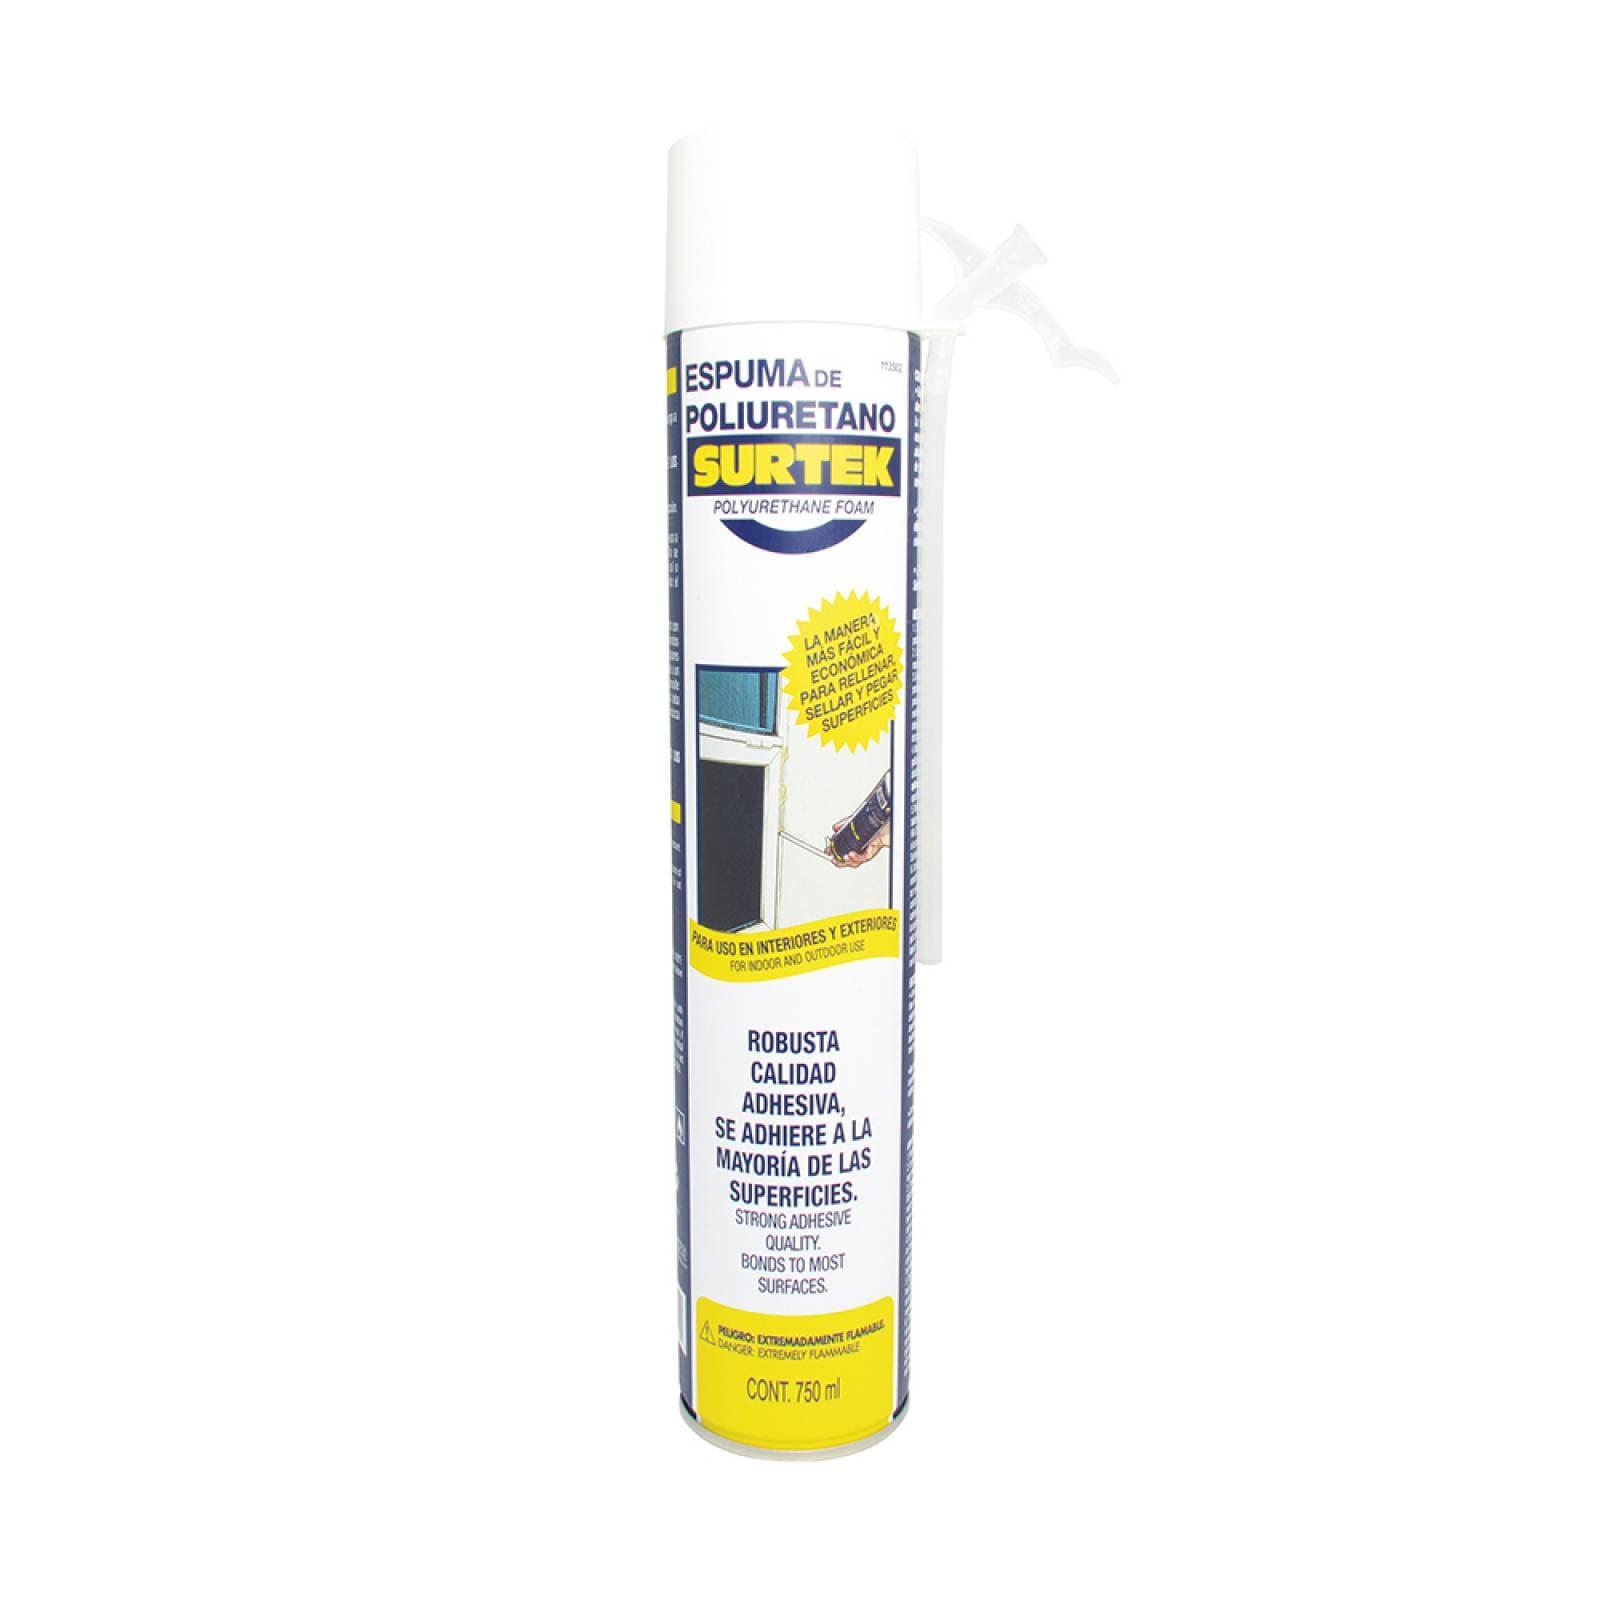 Espuma de poliuretano uso industrial 750 ml 113502 Surtek